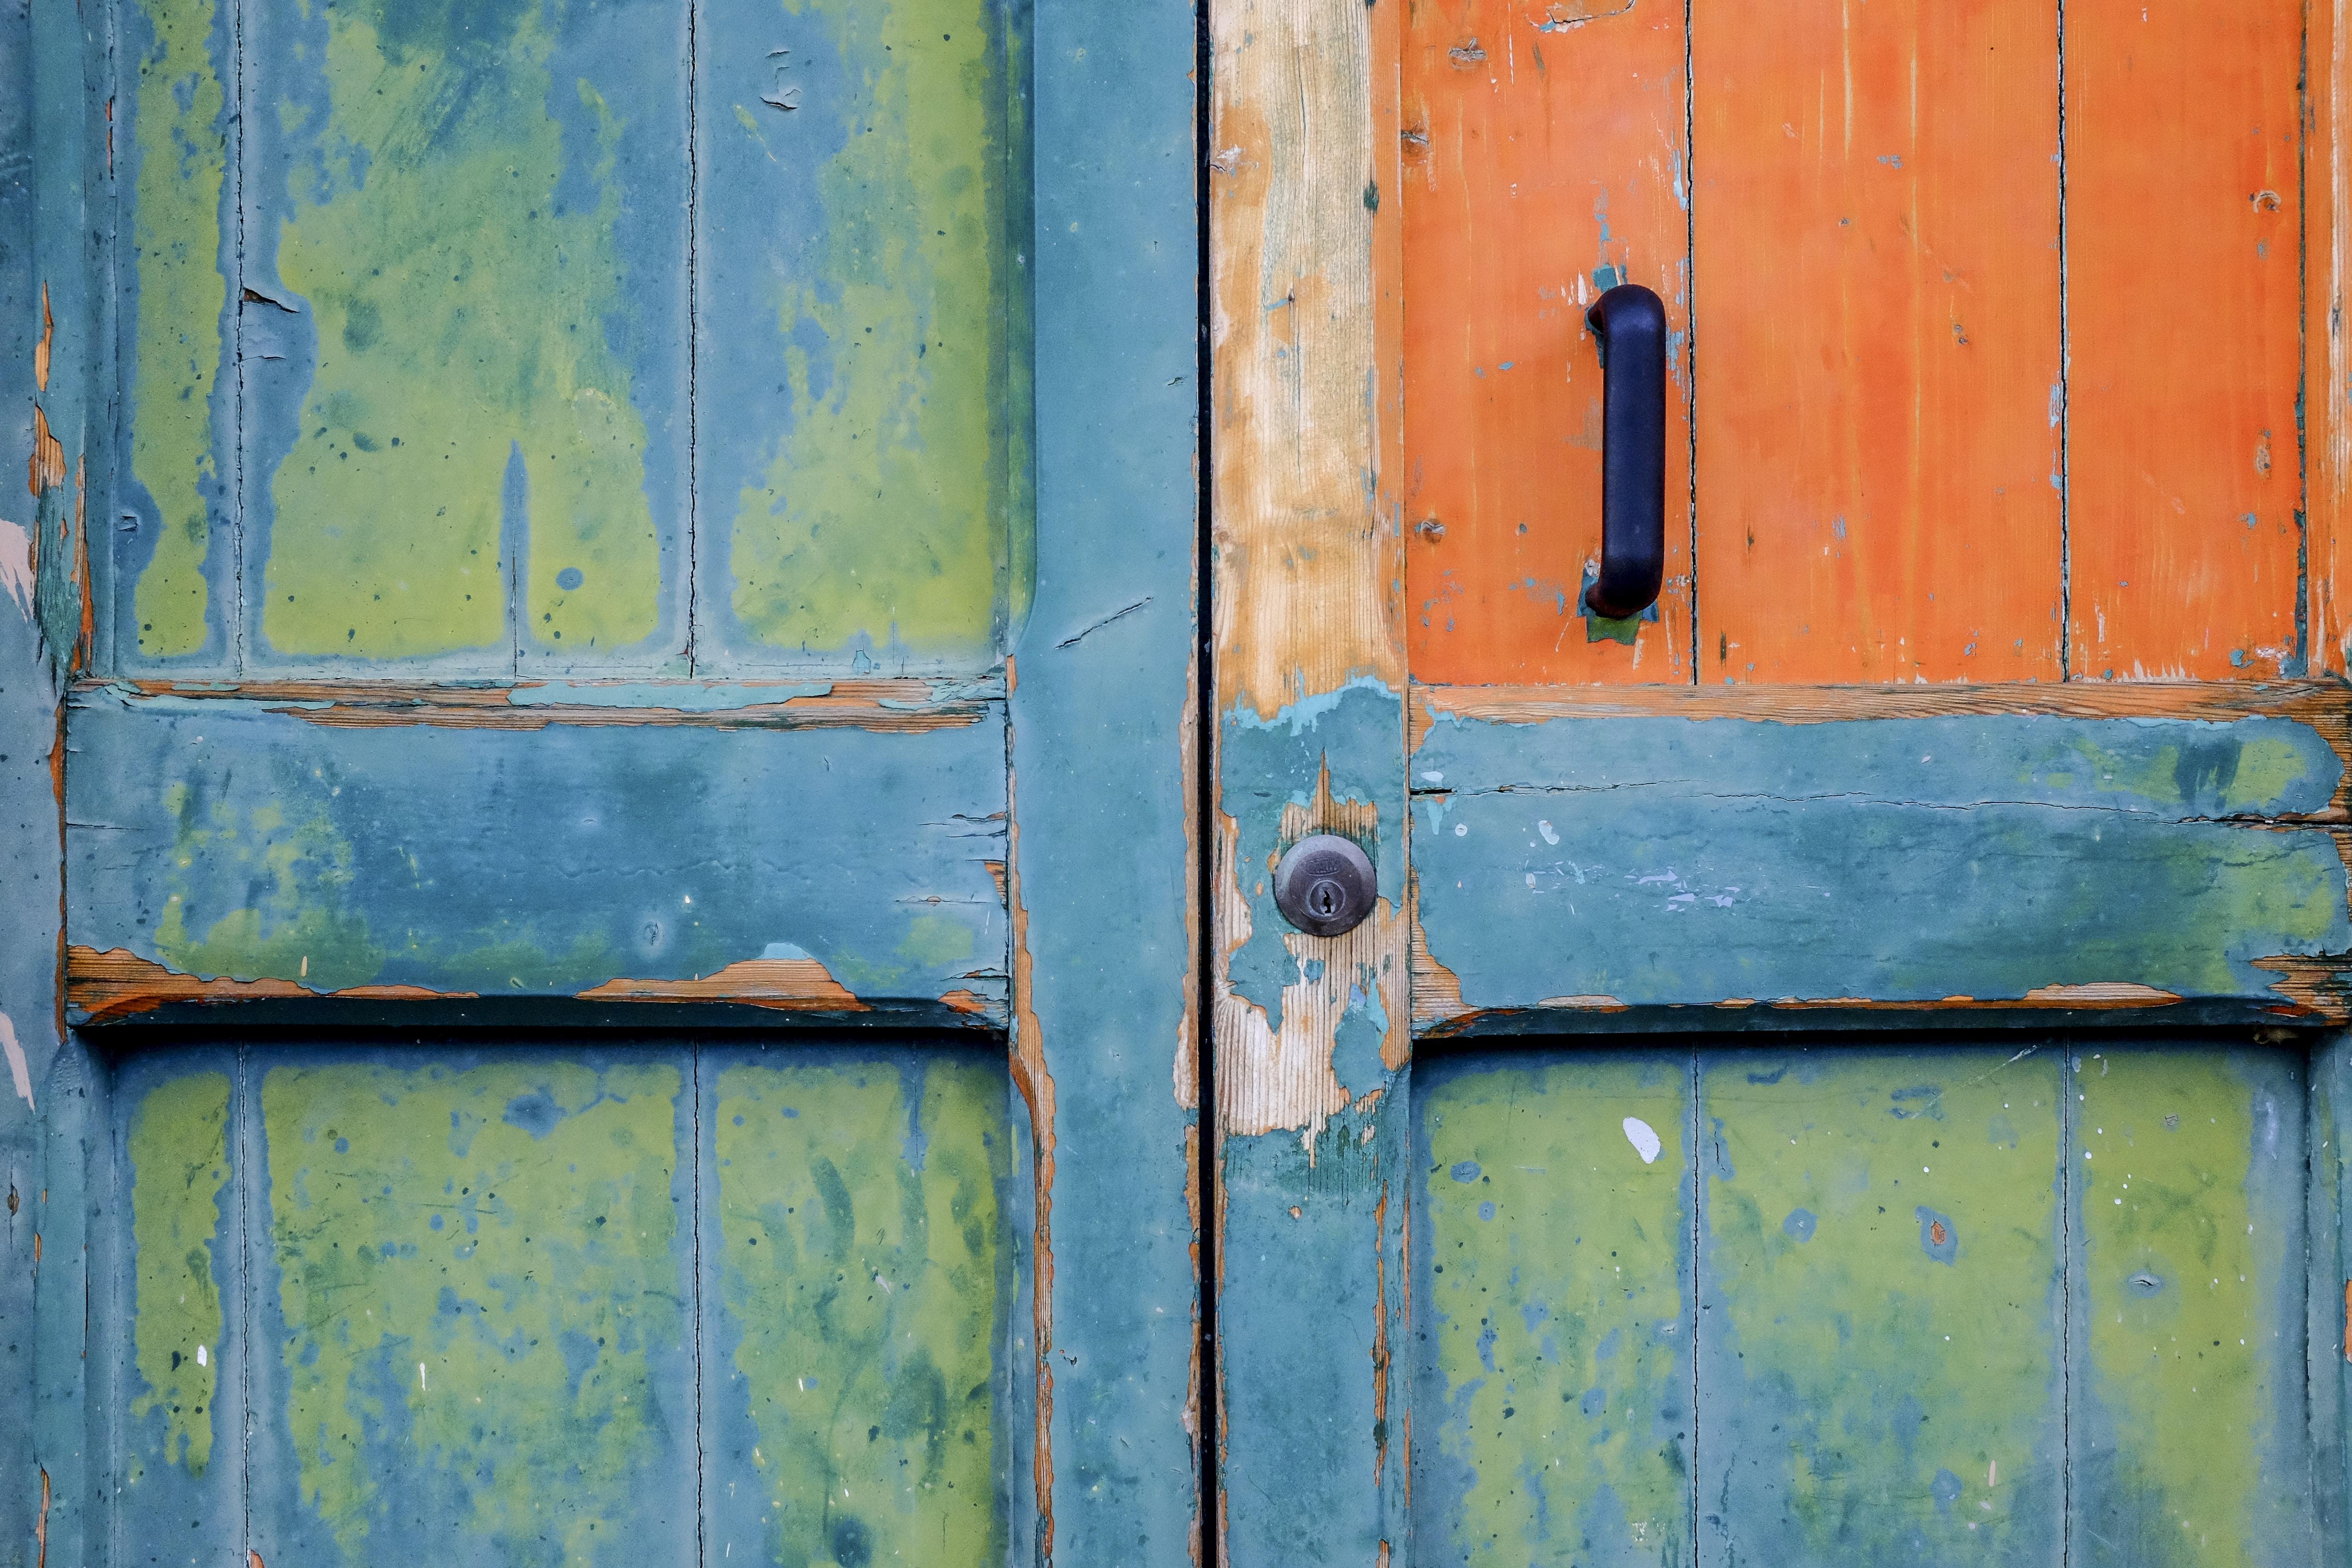 closeup view of blue and green wooden door